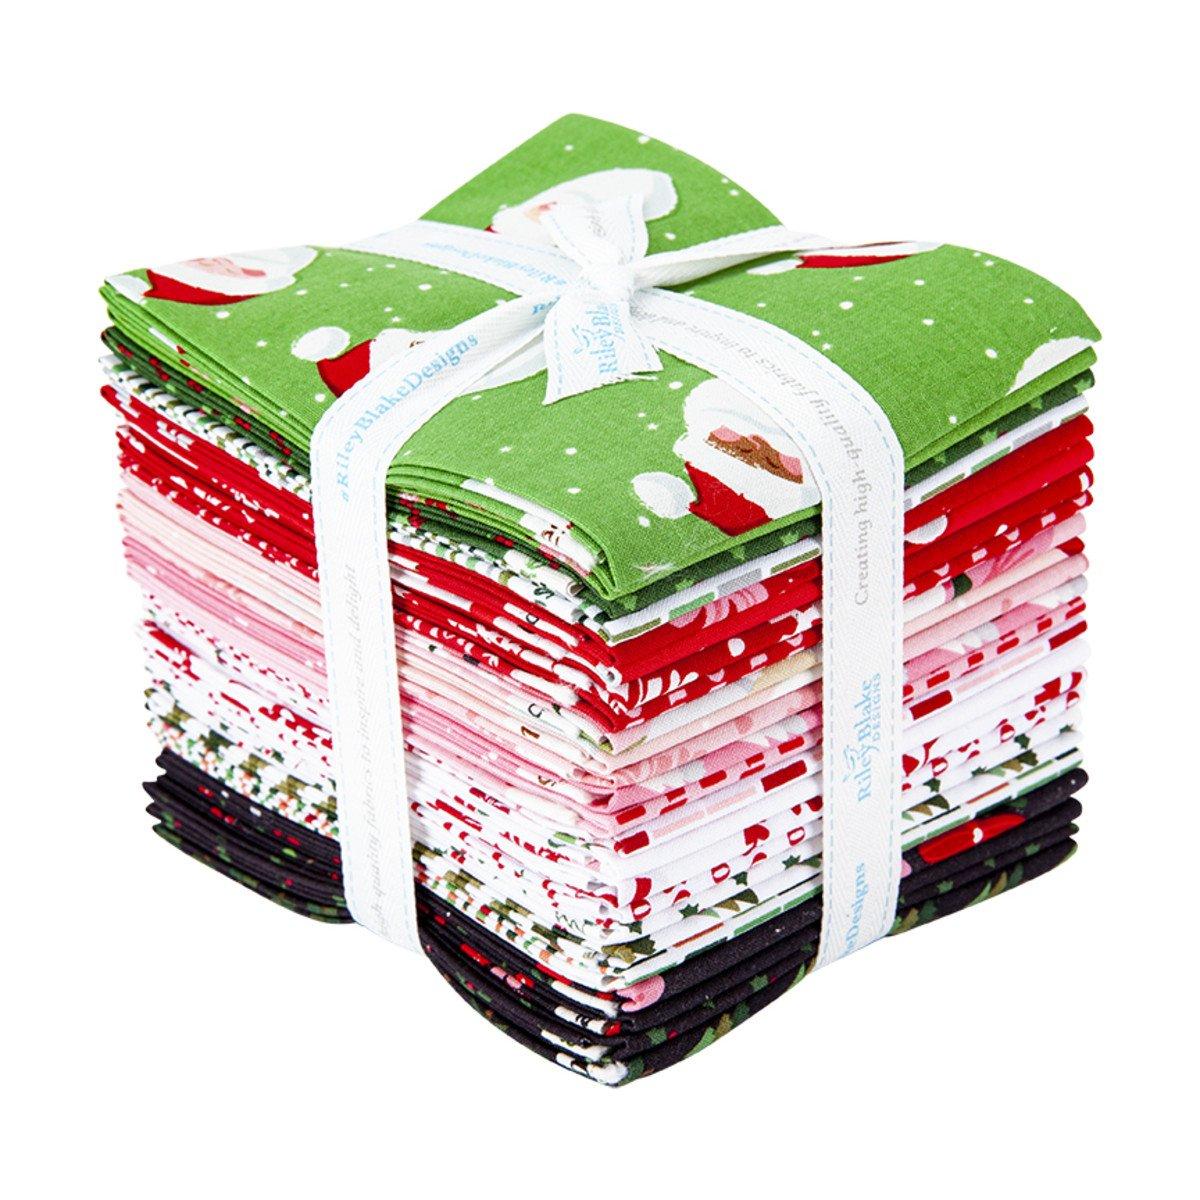 Holly Holiday Fat Quarter Bundles, 24pcs/bundle